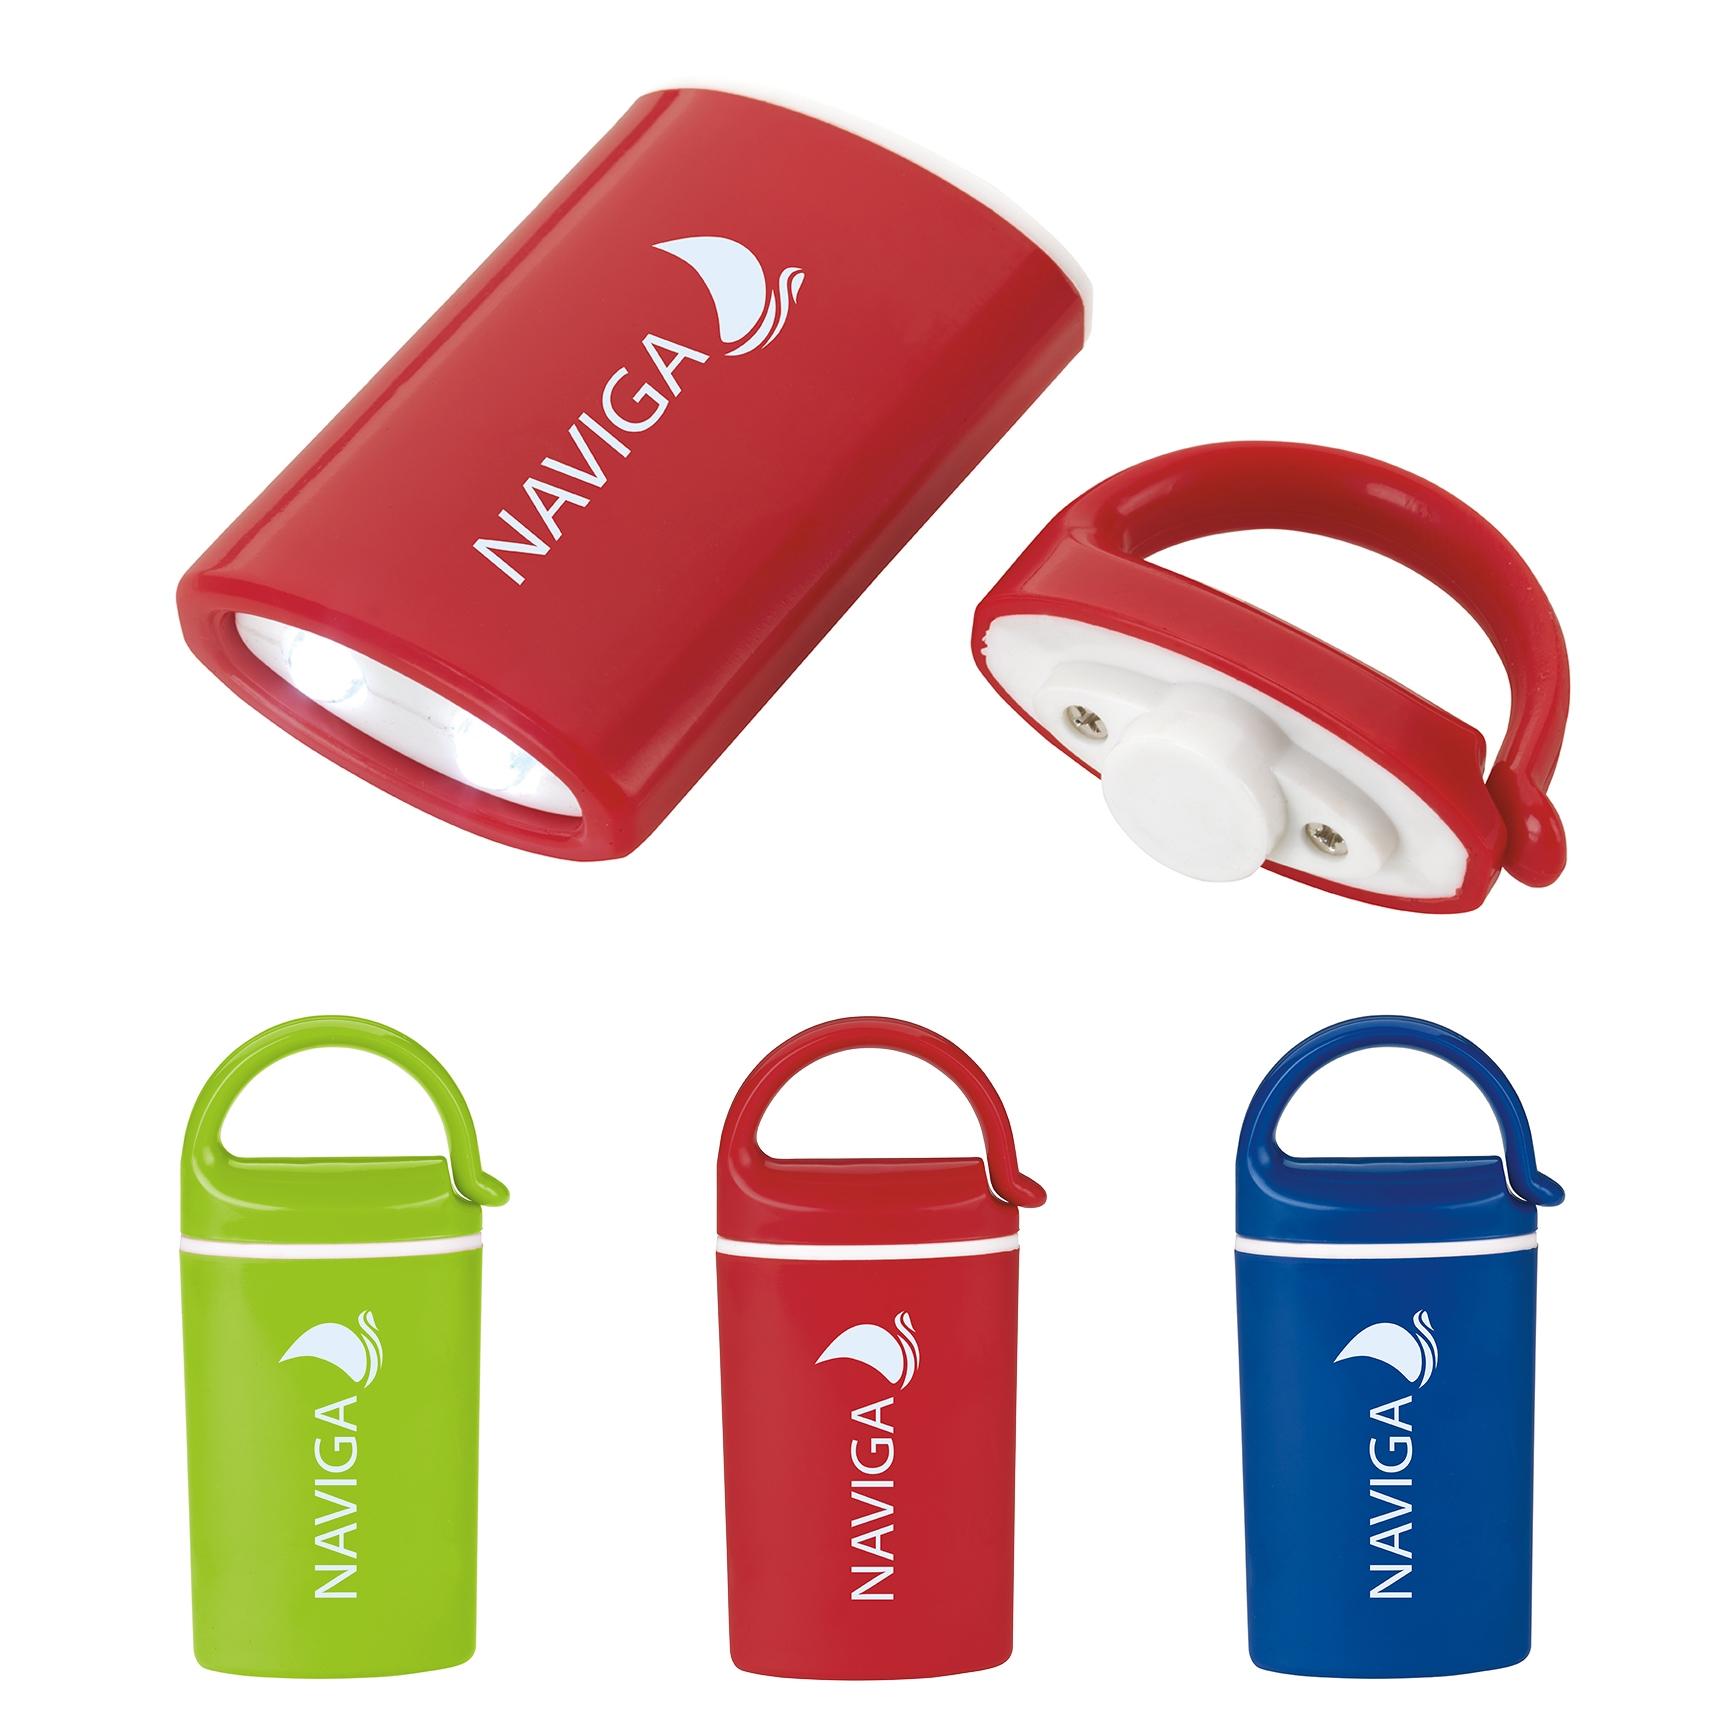 Mini Magnet Flashlight W/ Carabiner - 1 Colour Imprint